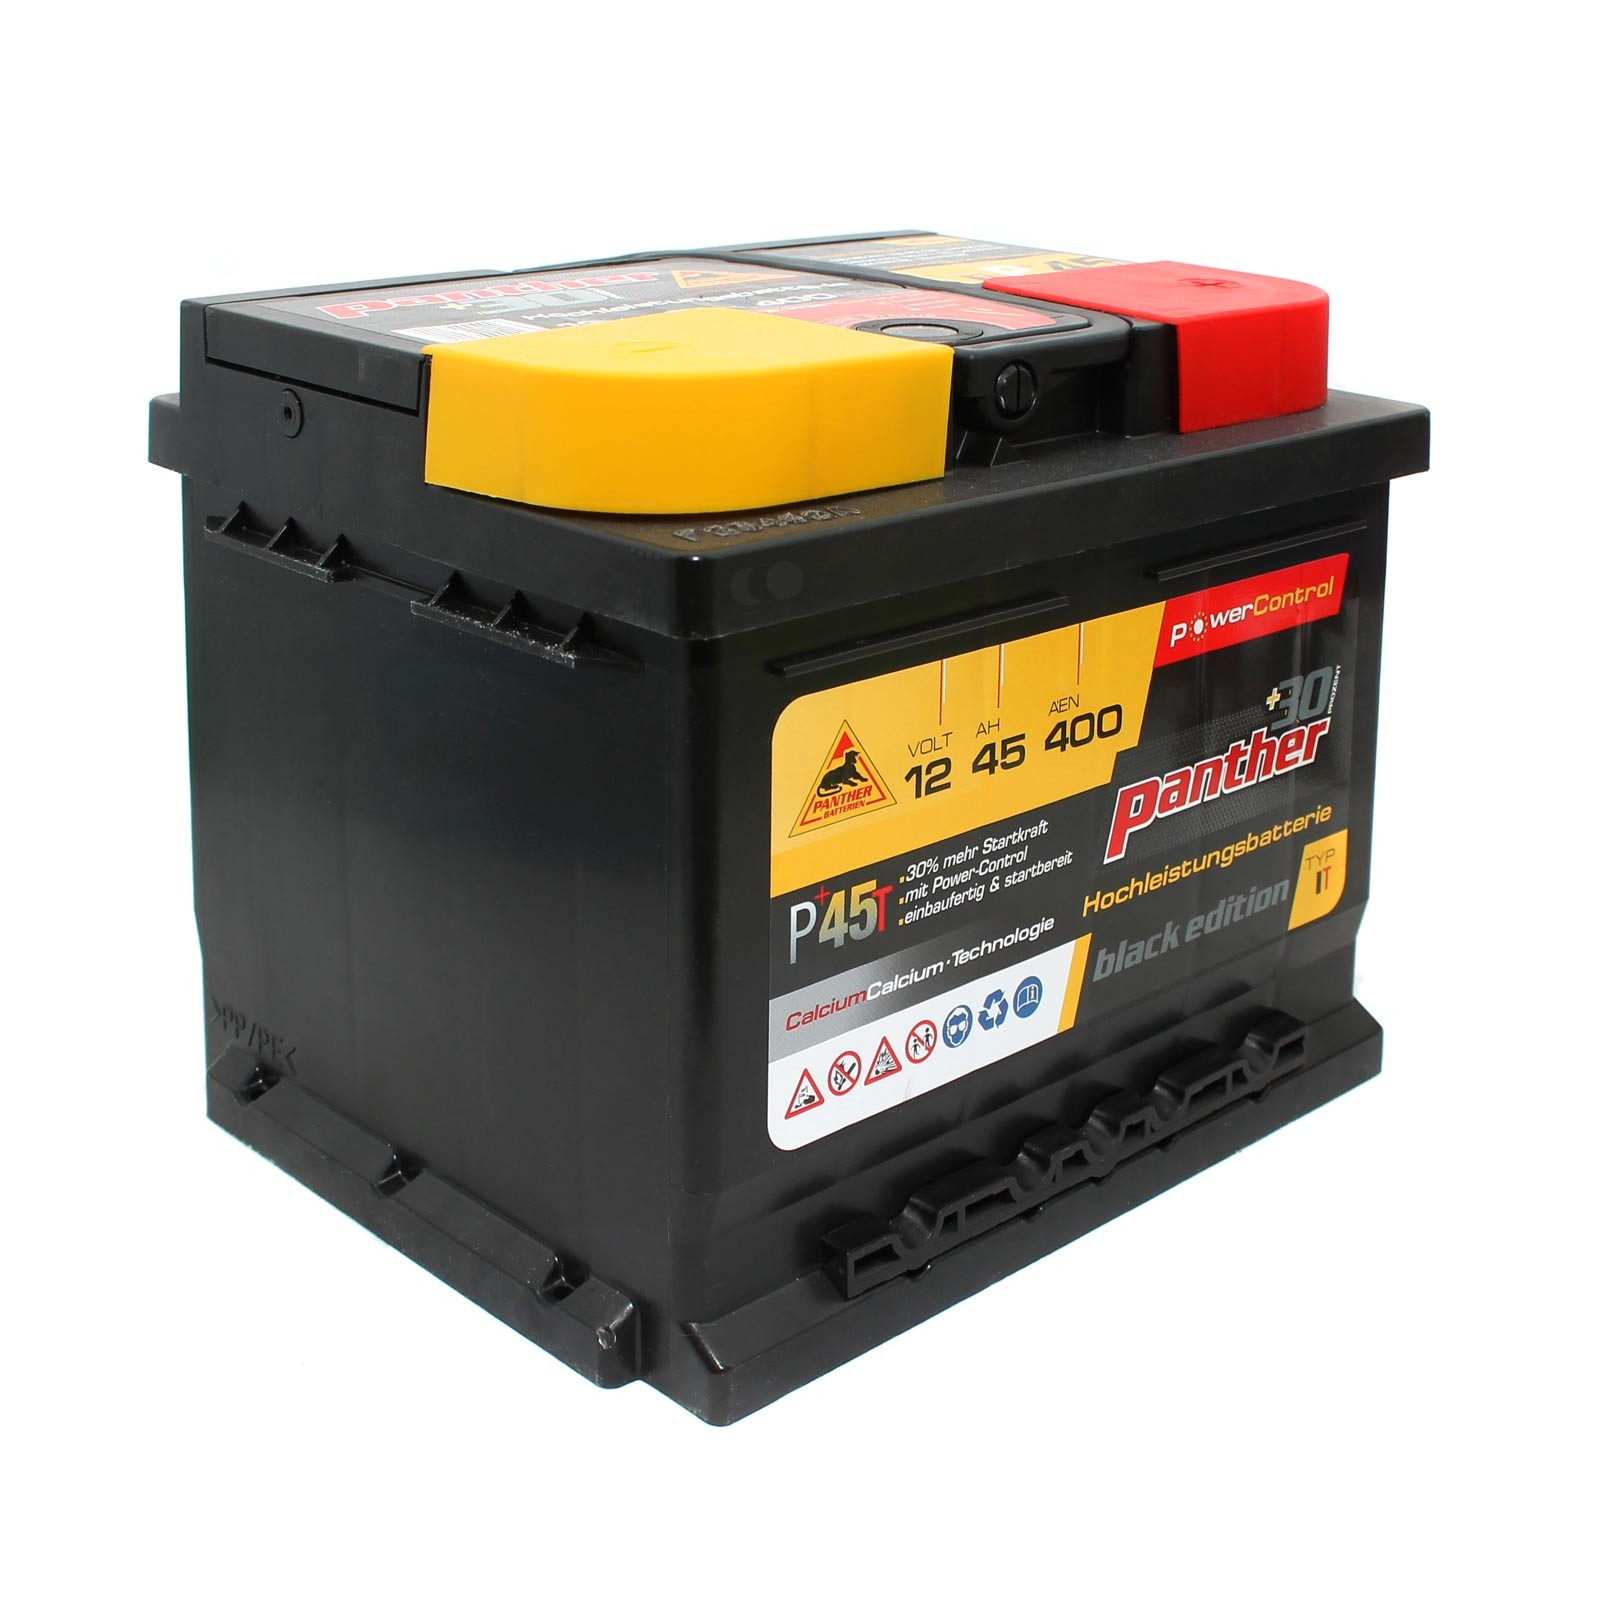 12v 45ah 400a auto batterie panther black edition p 45t. Black Bedroom Furniture Sets. Home Design Ideas